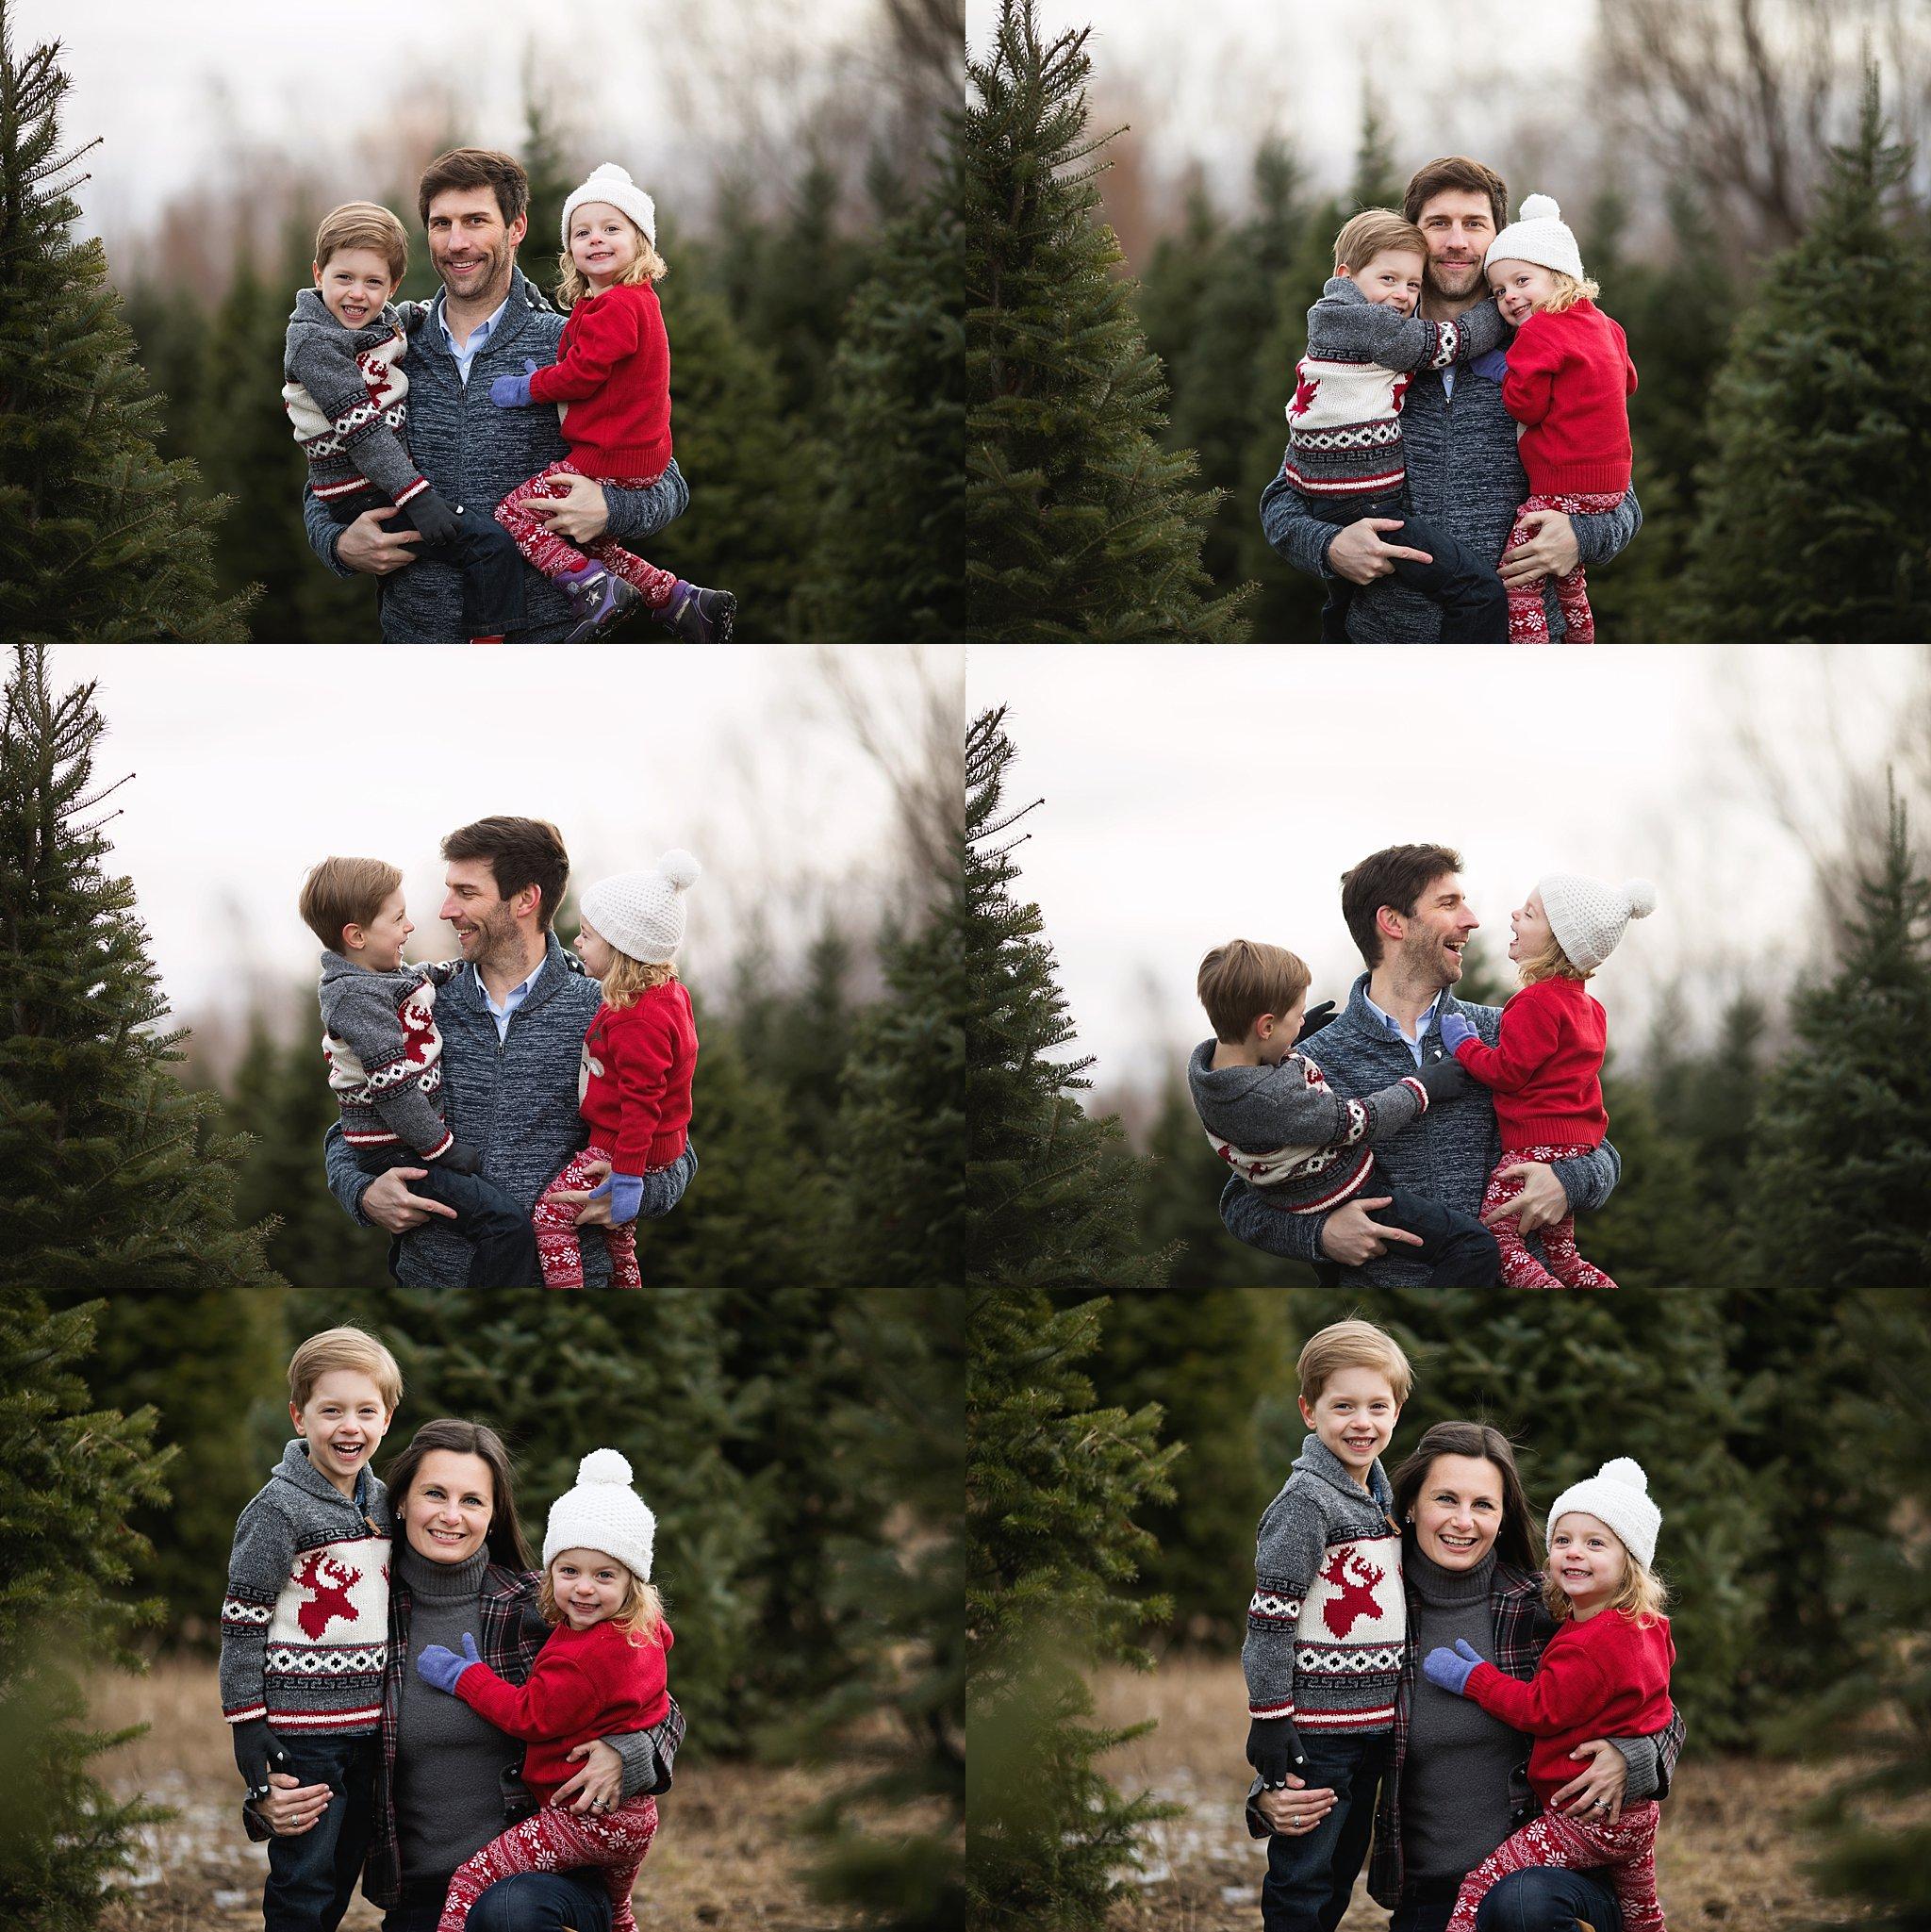 parents with children portraits outdoors